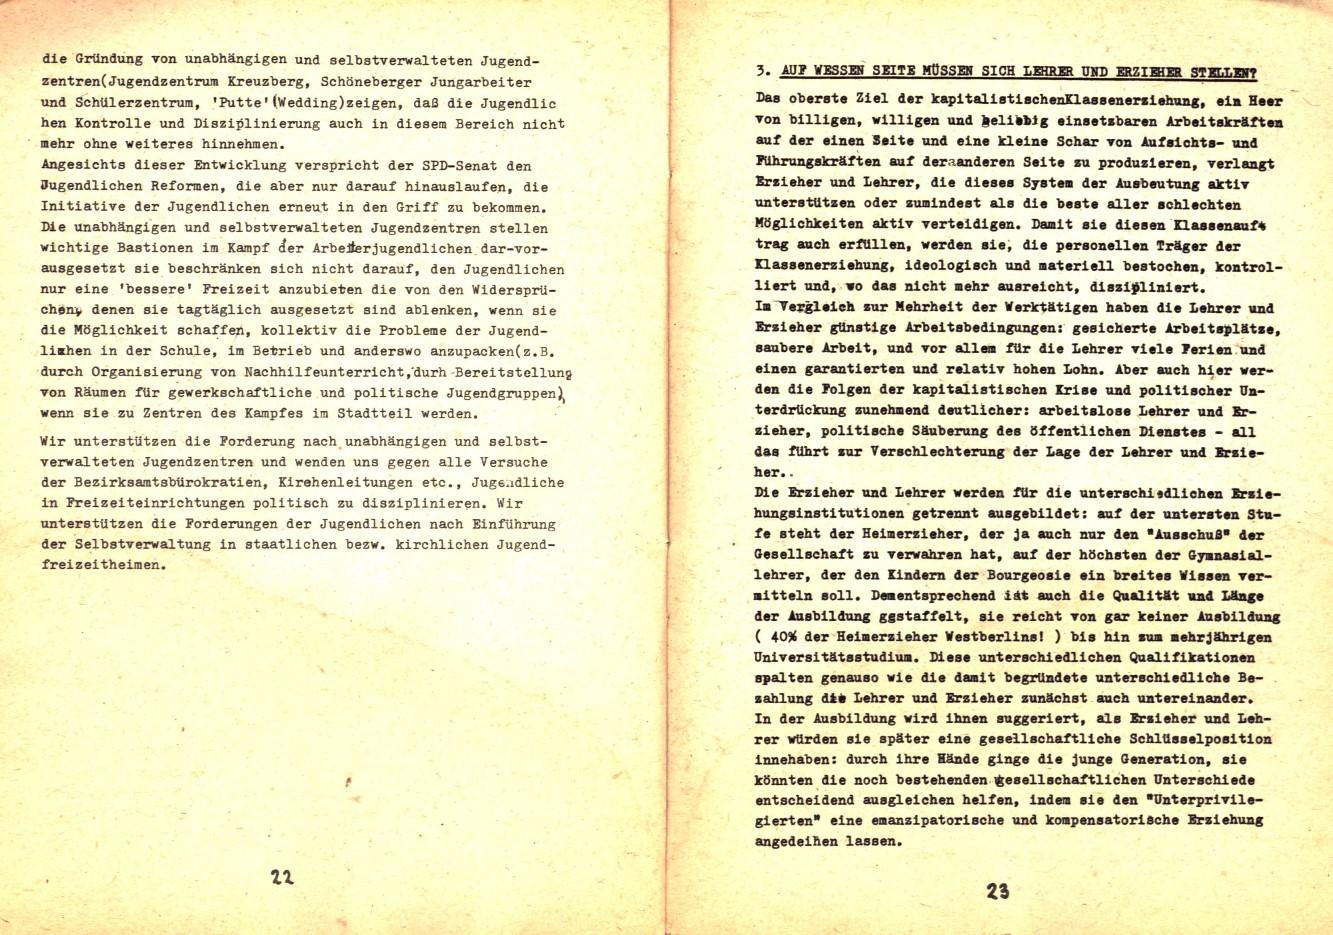 Berlin_BSLE_1975_Grundlagenpapier_13